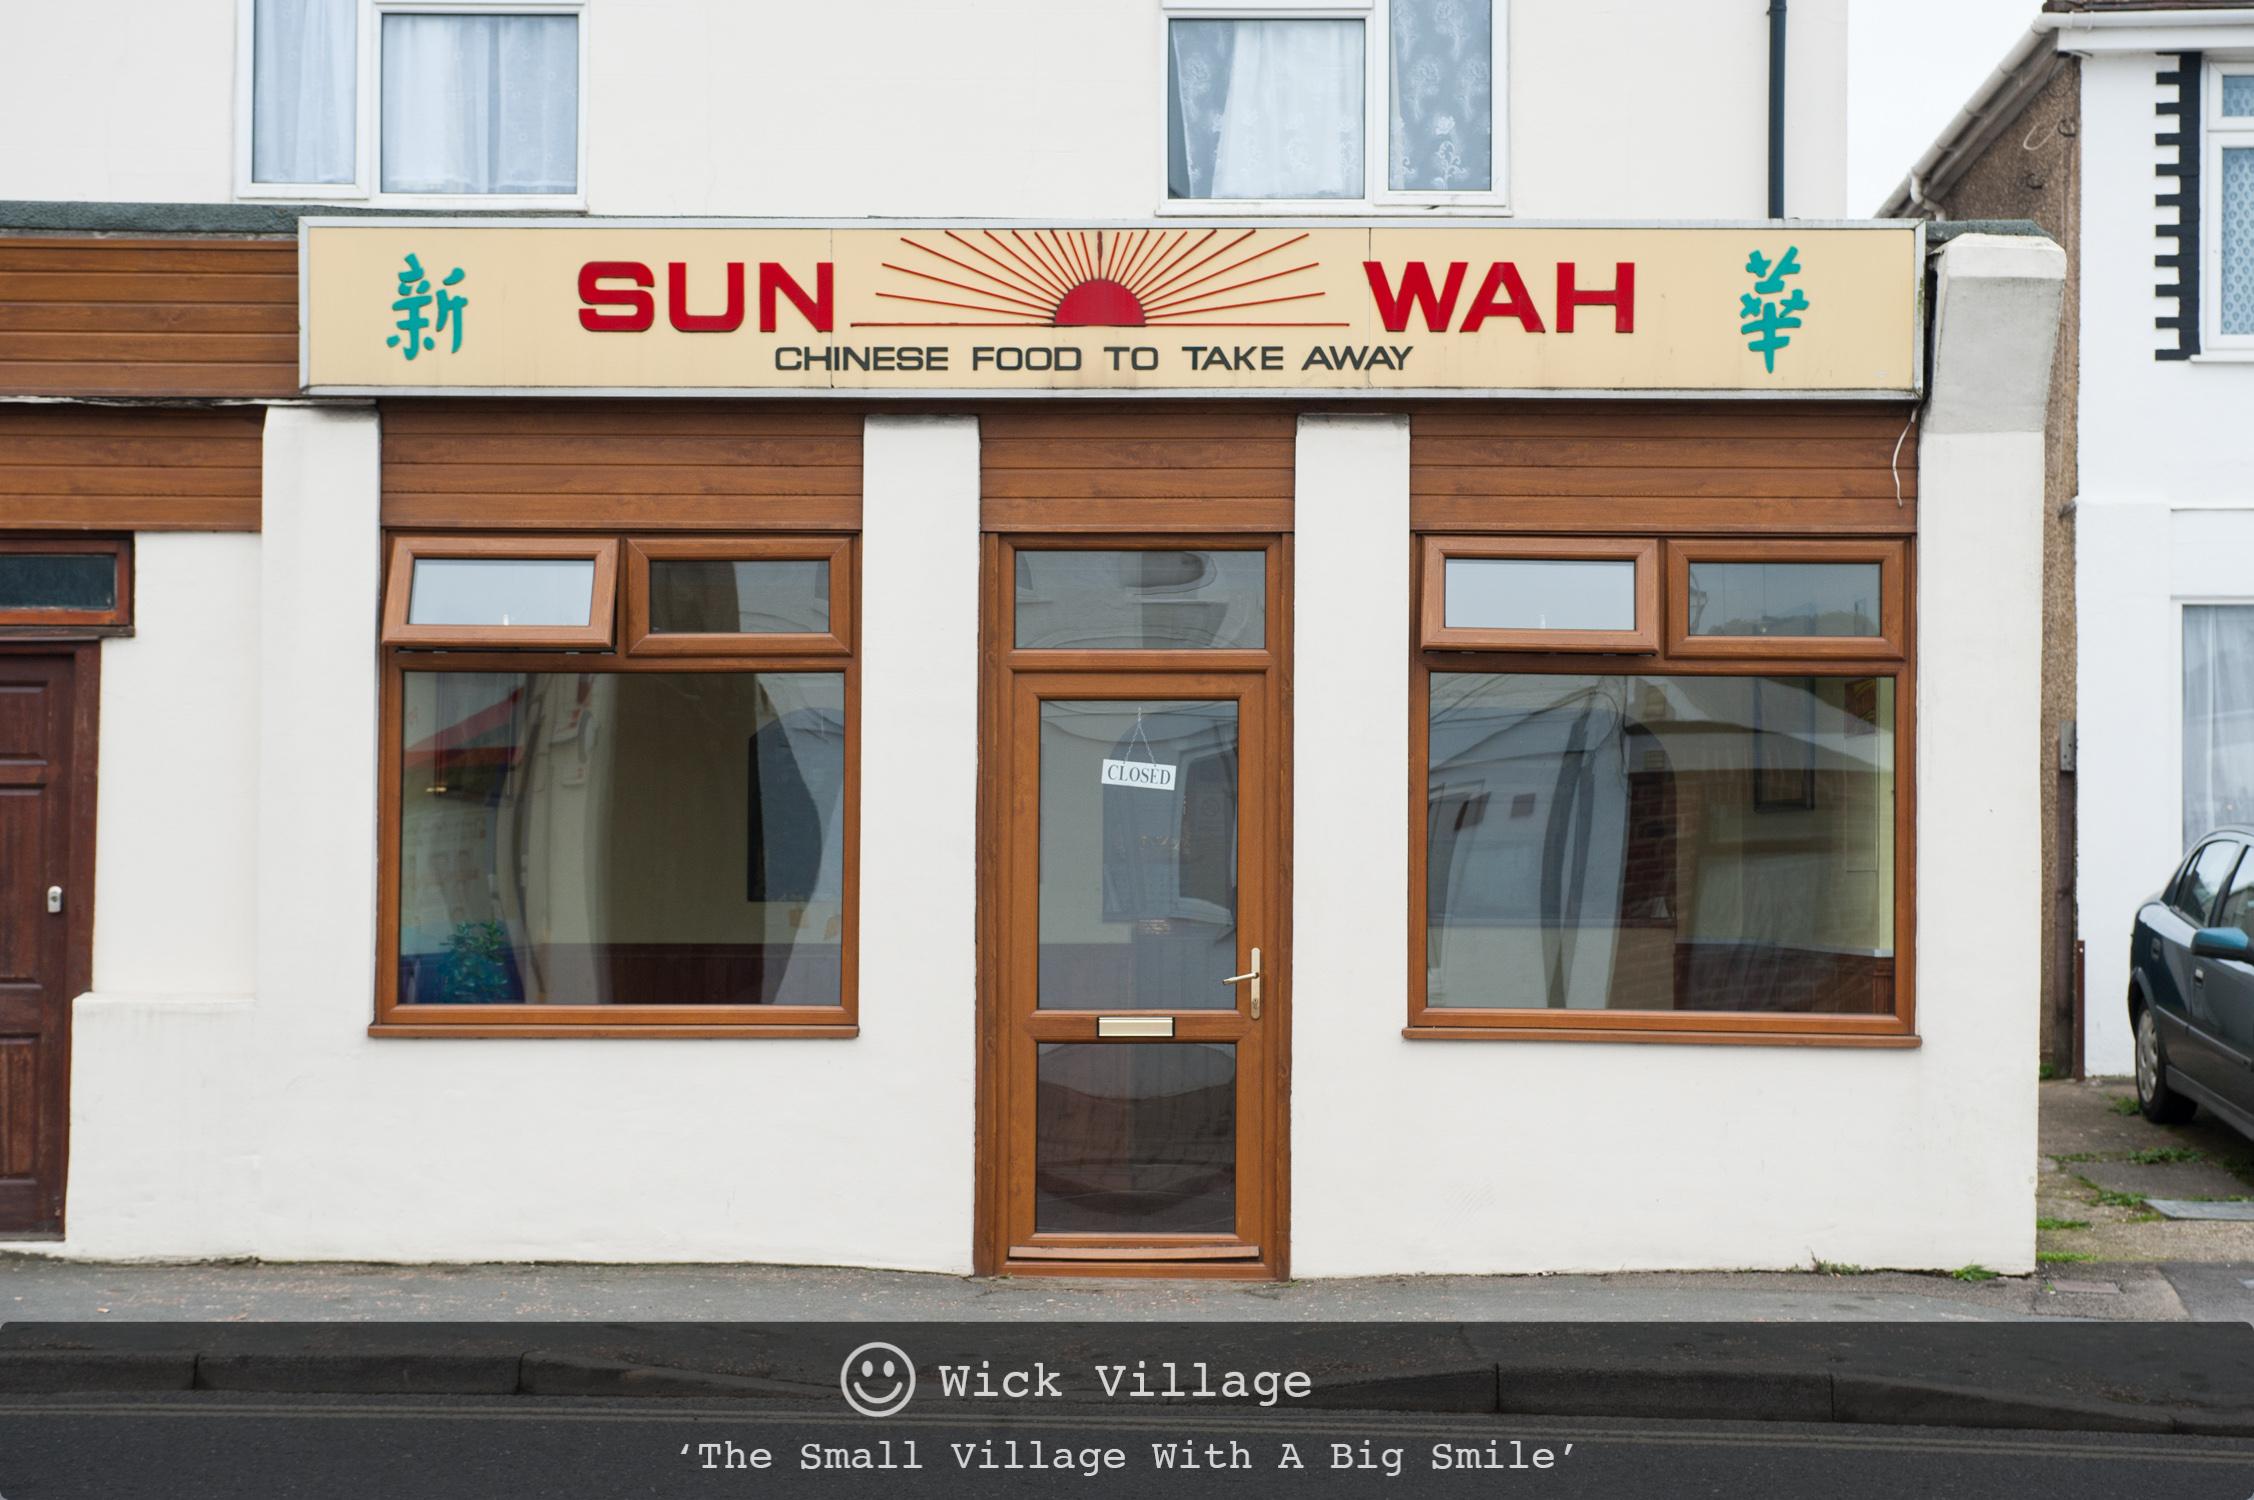 Sun Wah, Wick Village, Littlehampton.